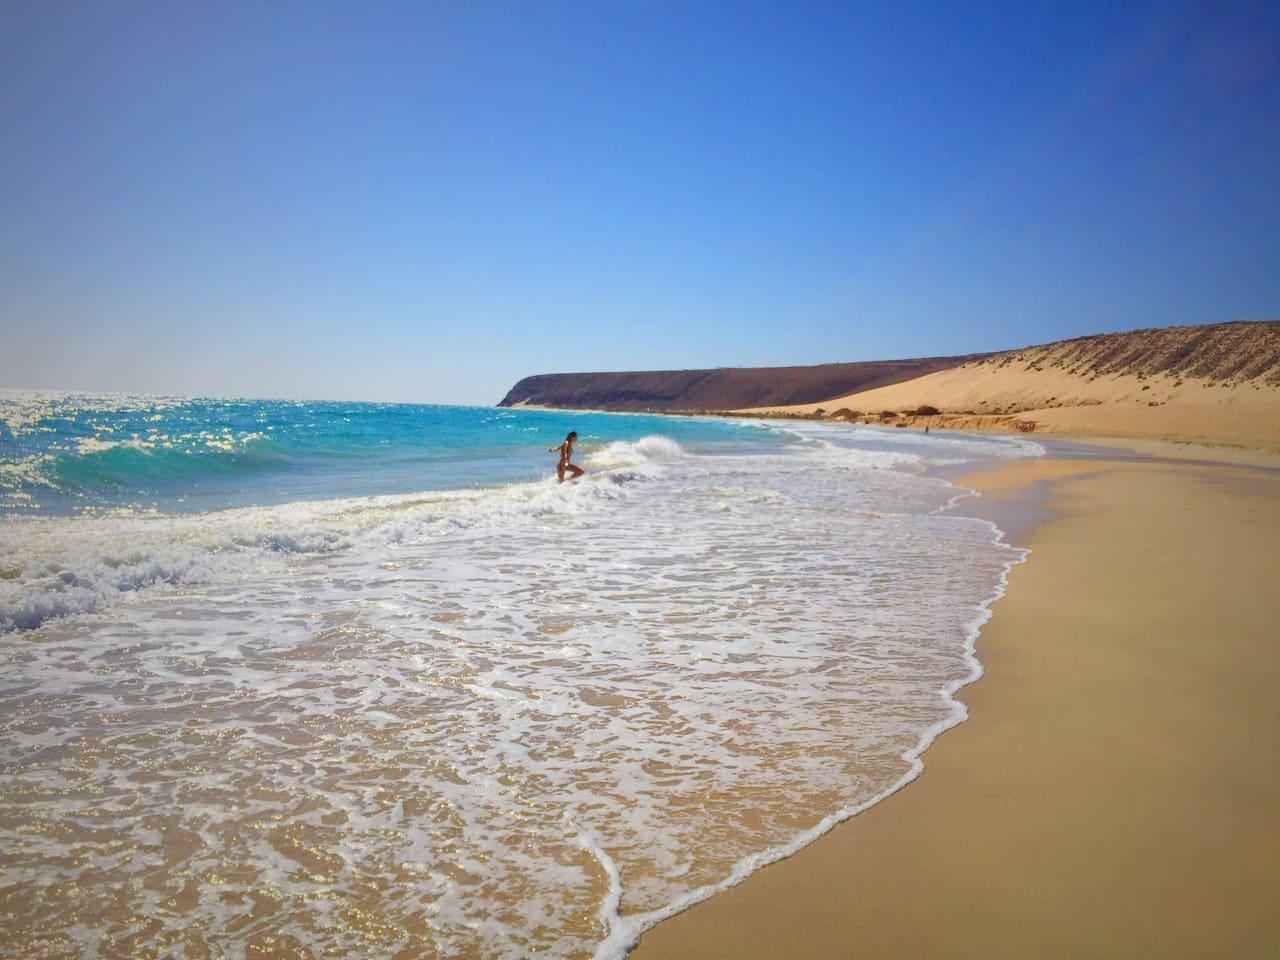 The amazing Costa Calma beach: eternal sun, sea, sand and sky...